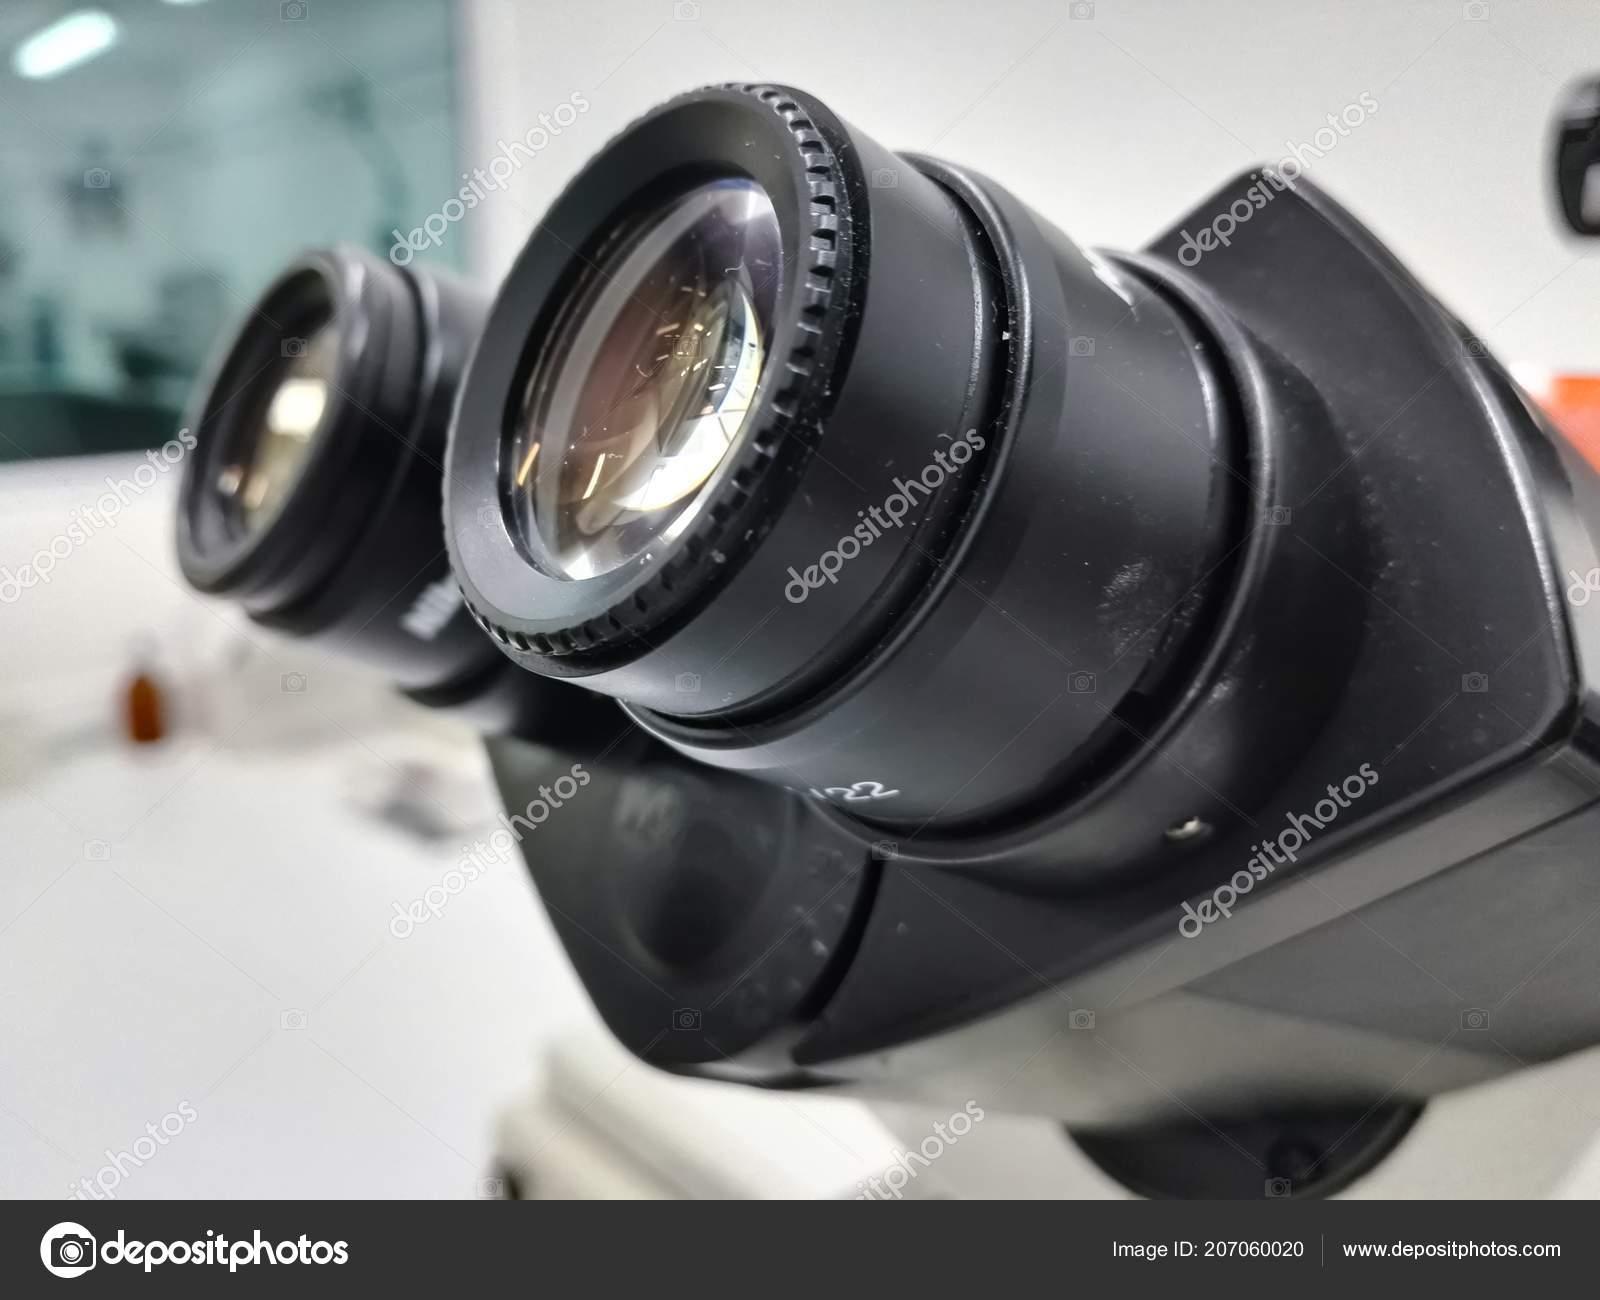 273bc3856a Κεφαλής (η ρύθμιση διόπτρας) και ένα ζευγάρι προσοφθάλμιοι φακοί (οφθαλμική  φακό) από ένα μικροσκόπιο υψηλής τεχνολογίας σε ένα υπόβαθρο επιστημονικό  ...